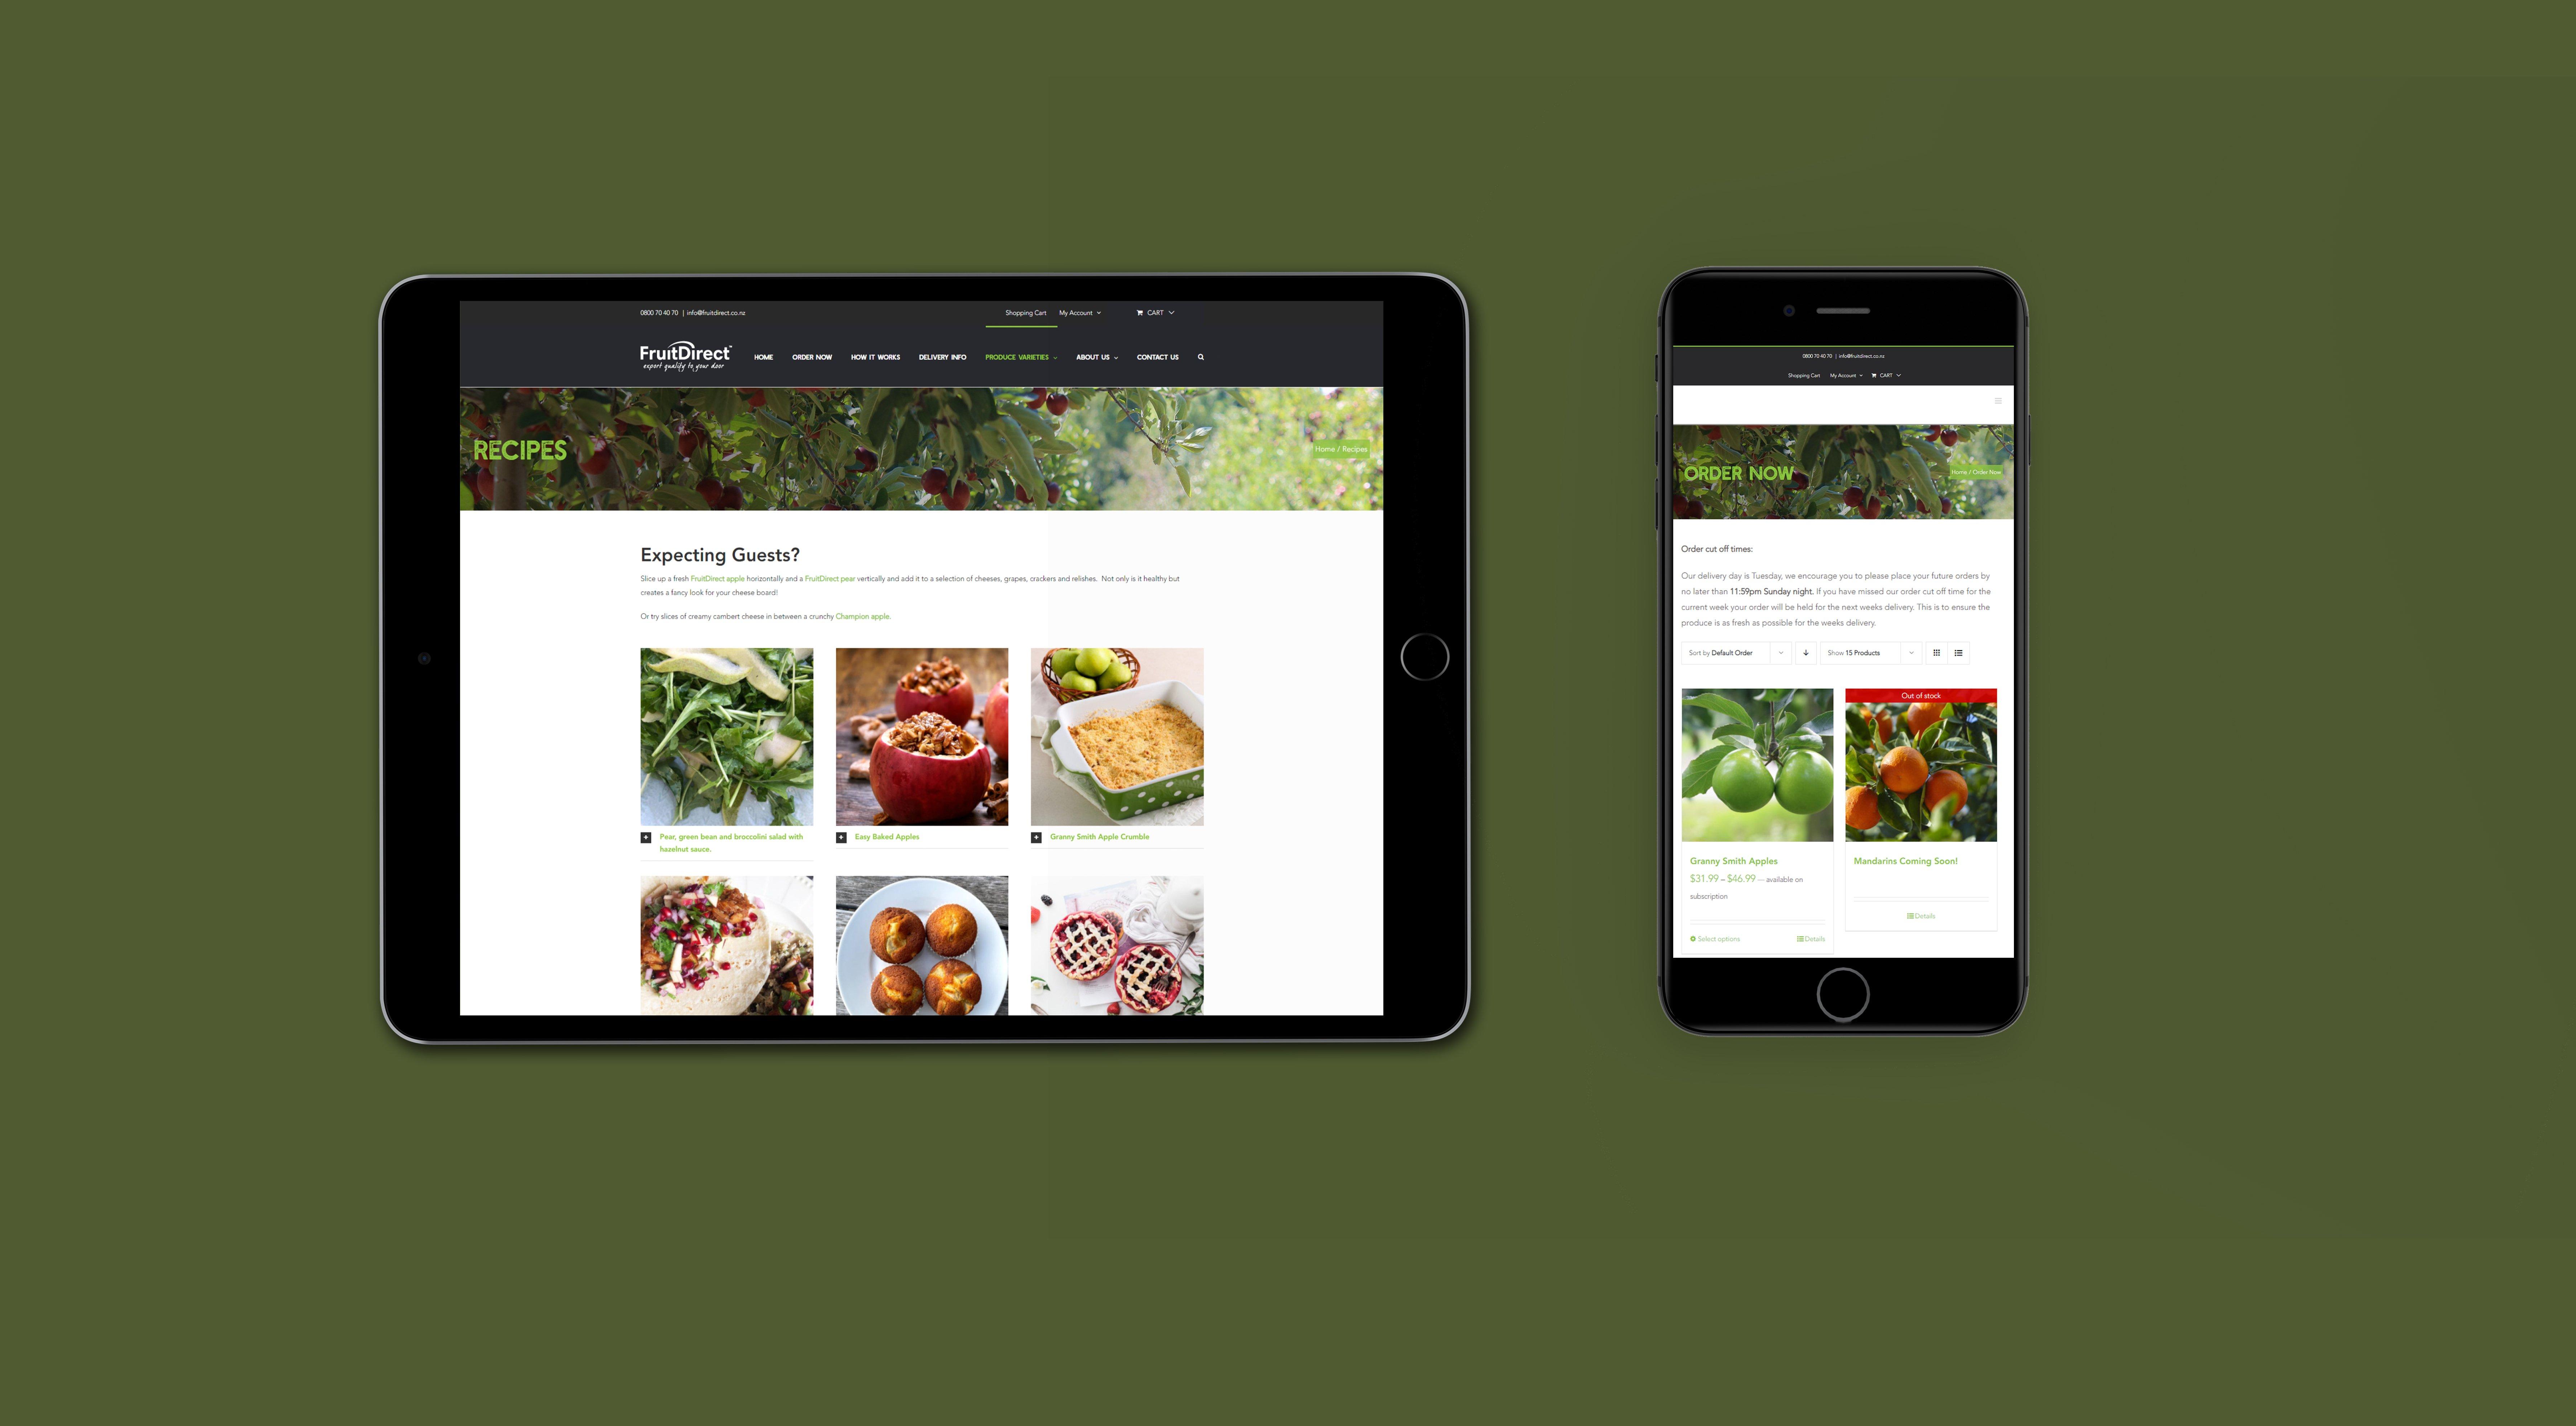 ipad - iPhone - mockup recepies and order